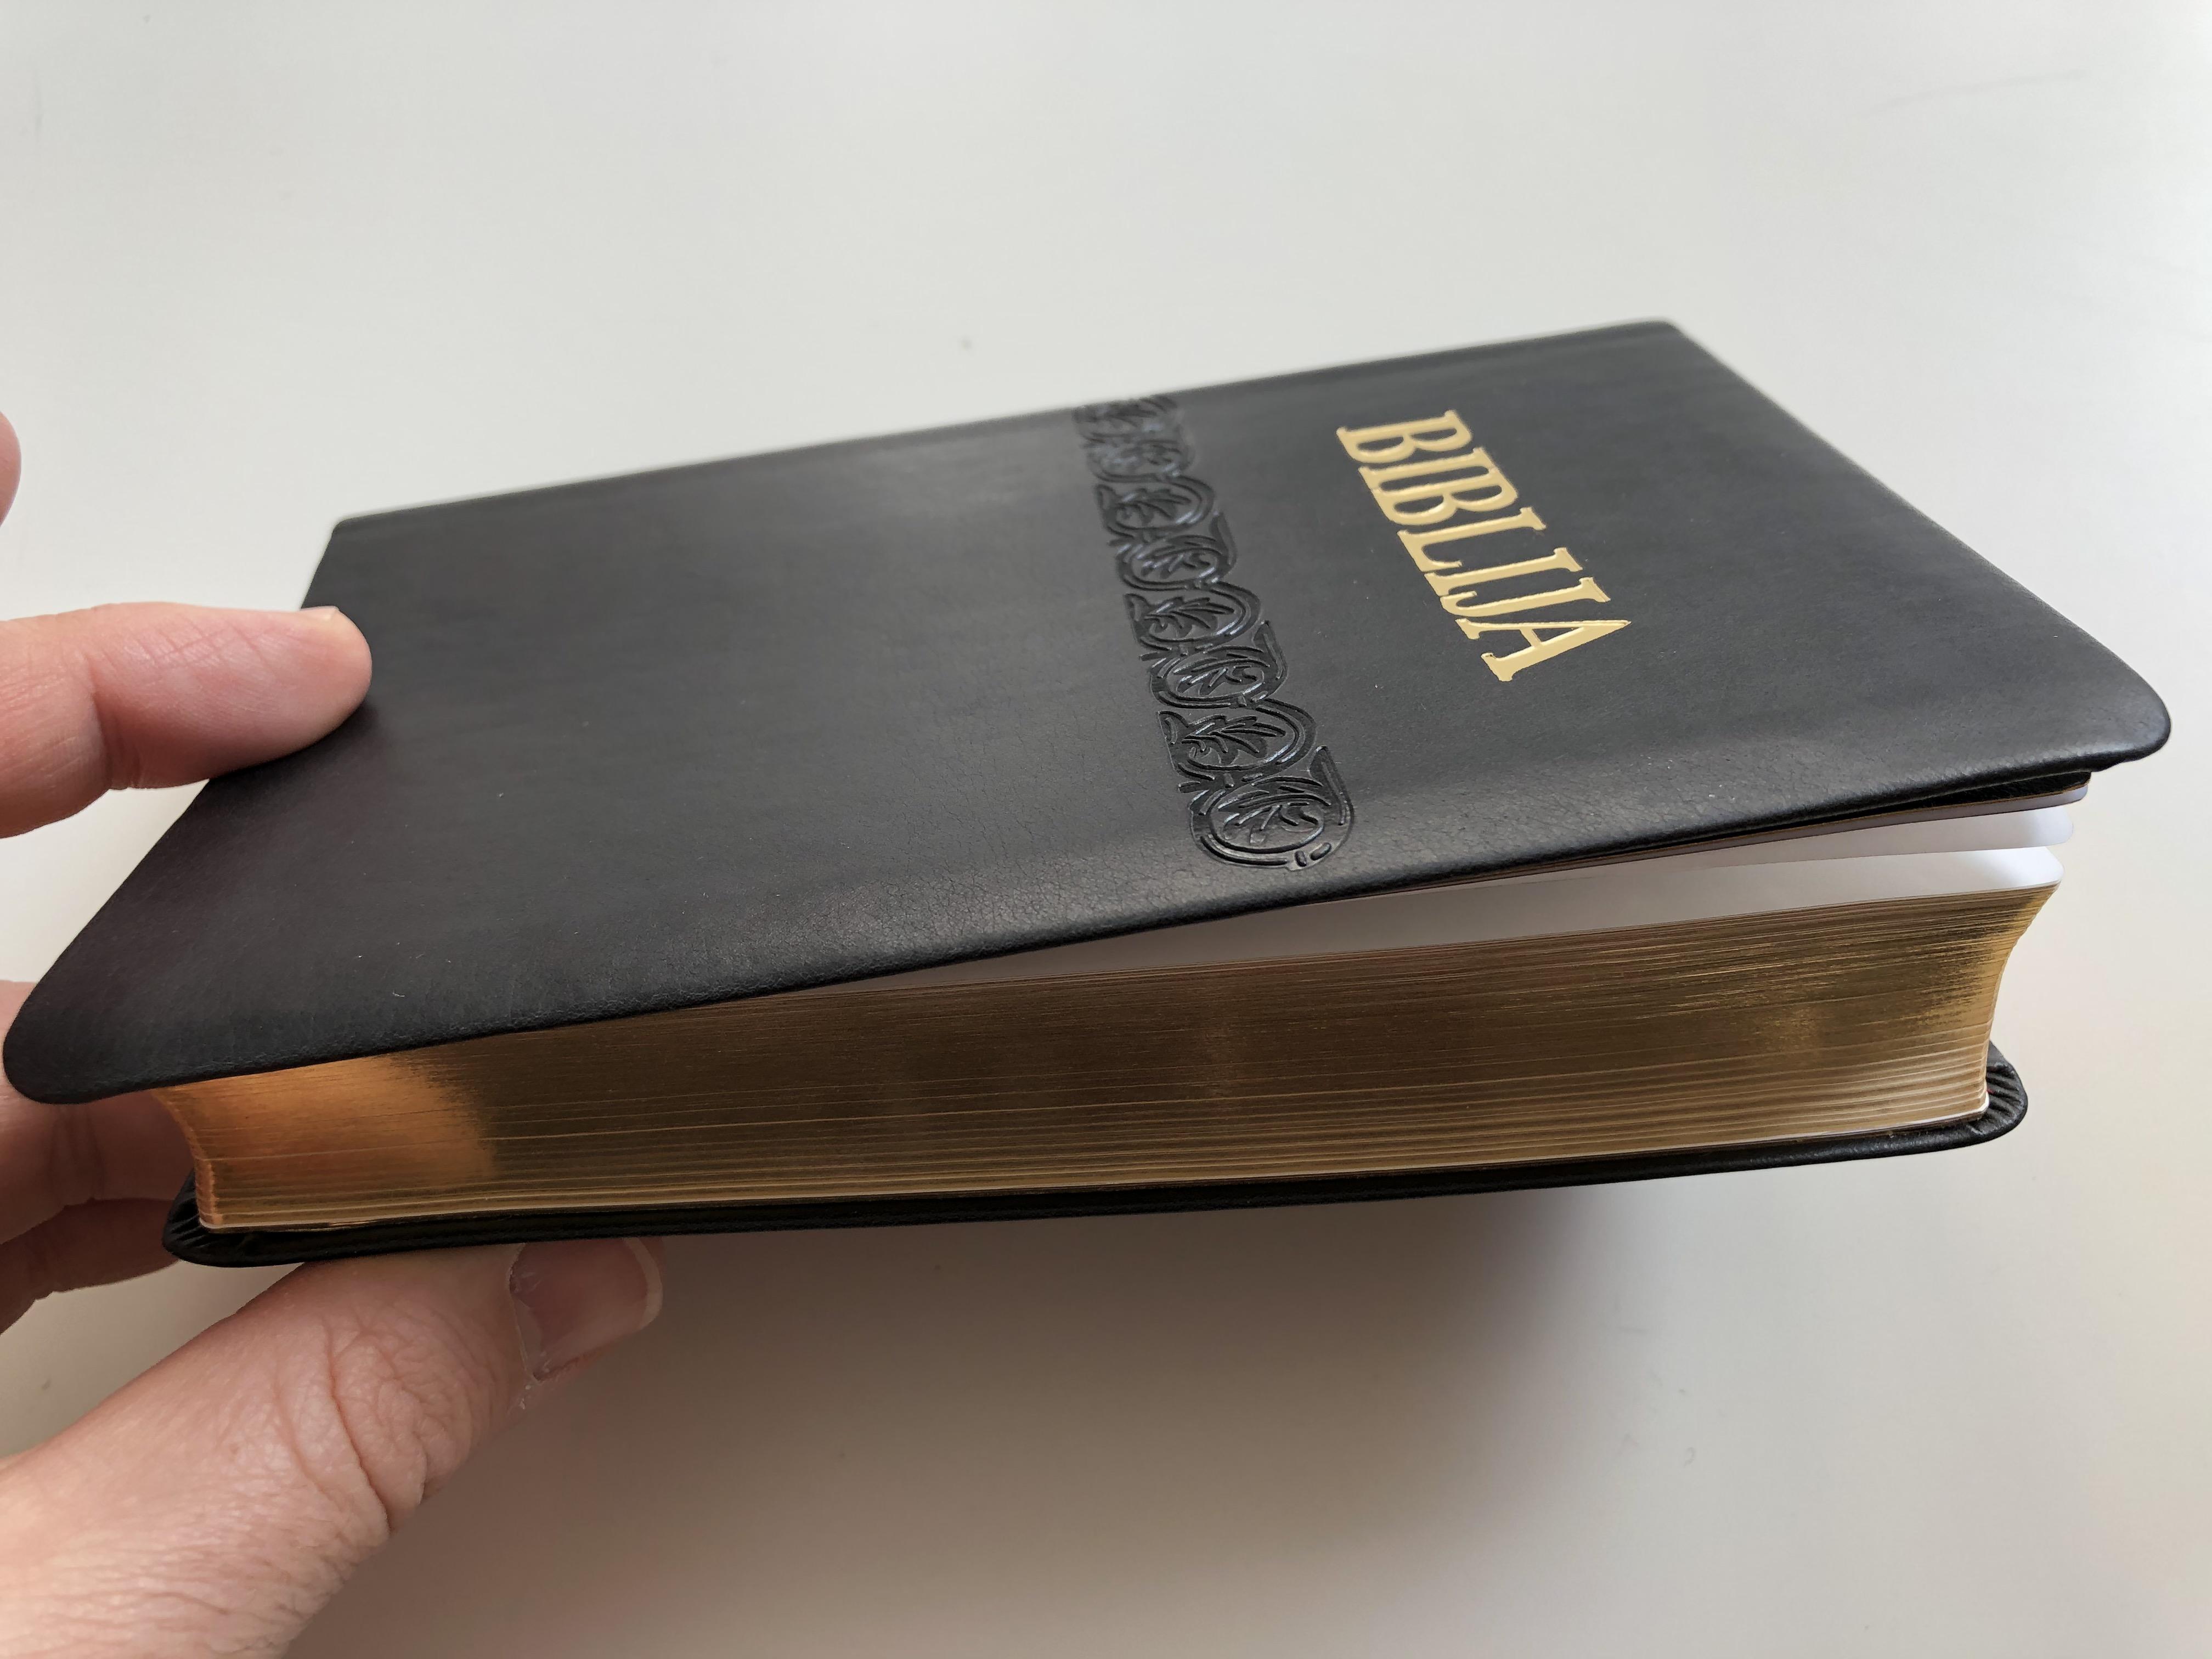 biblija-holy-bible-in-croatian-language-leather-bound-black-golden-edges-13.jpg